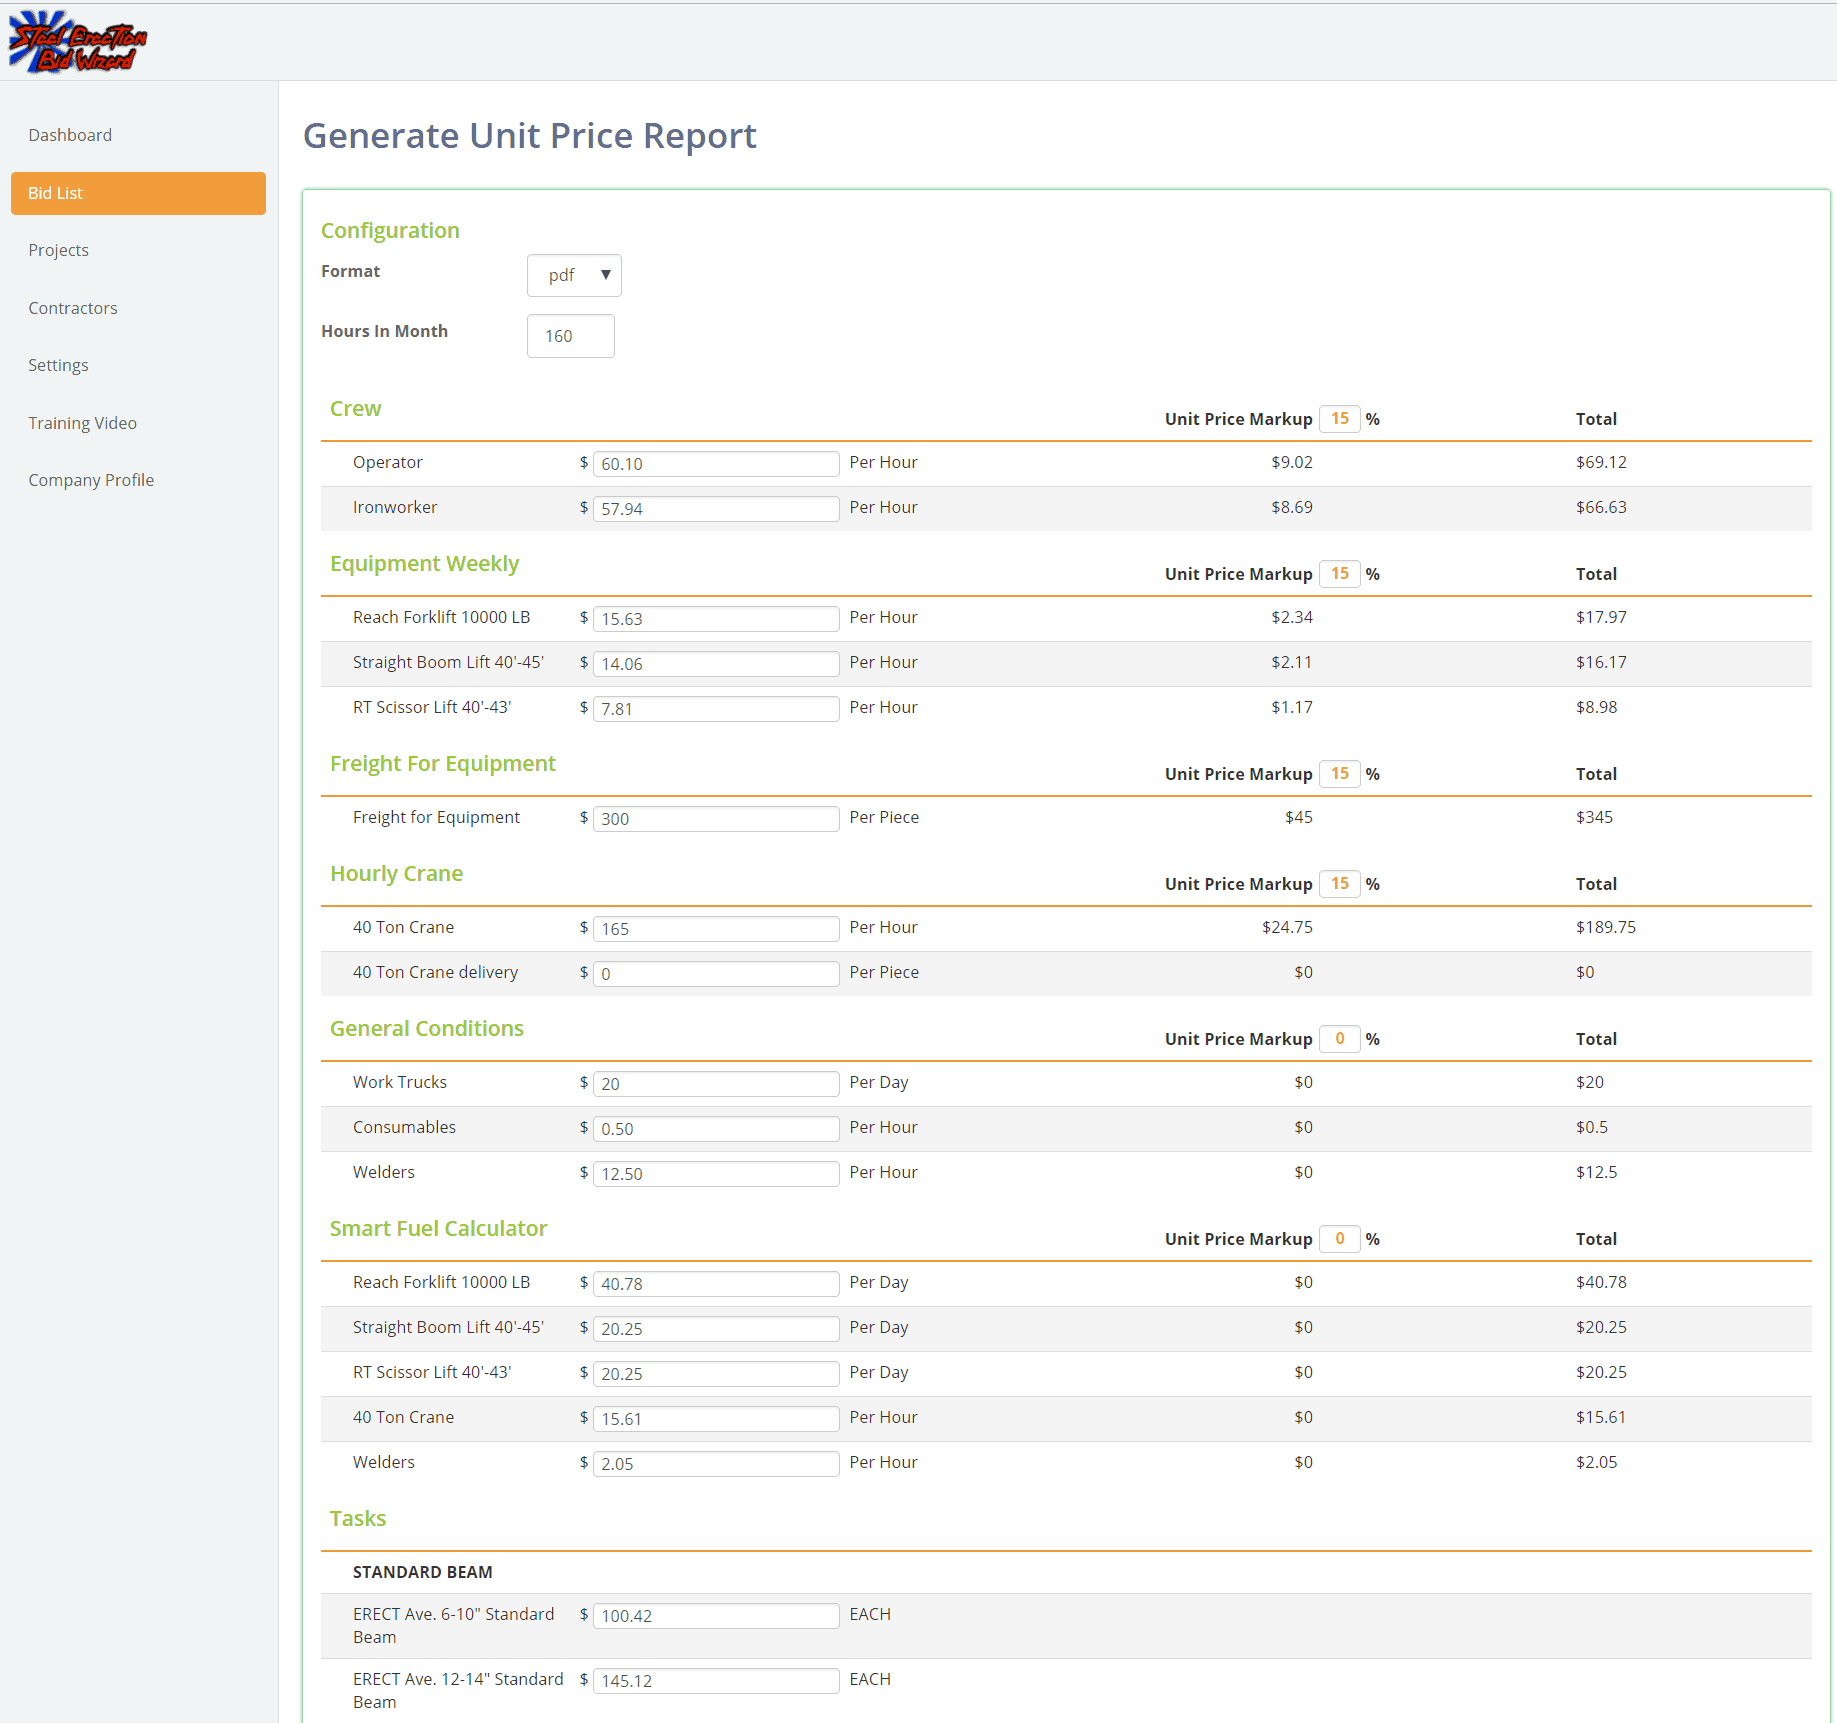 Steel Erection Bid Wizard New Job Cost & Unit Price Reports